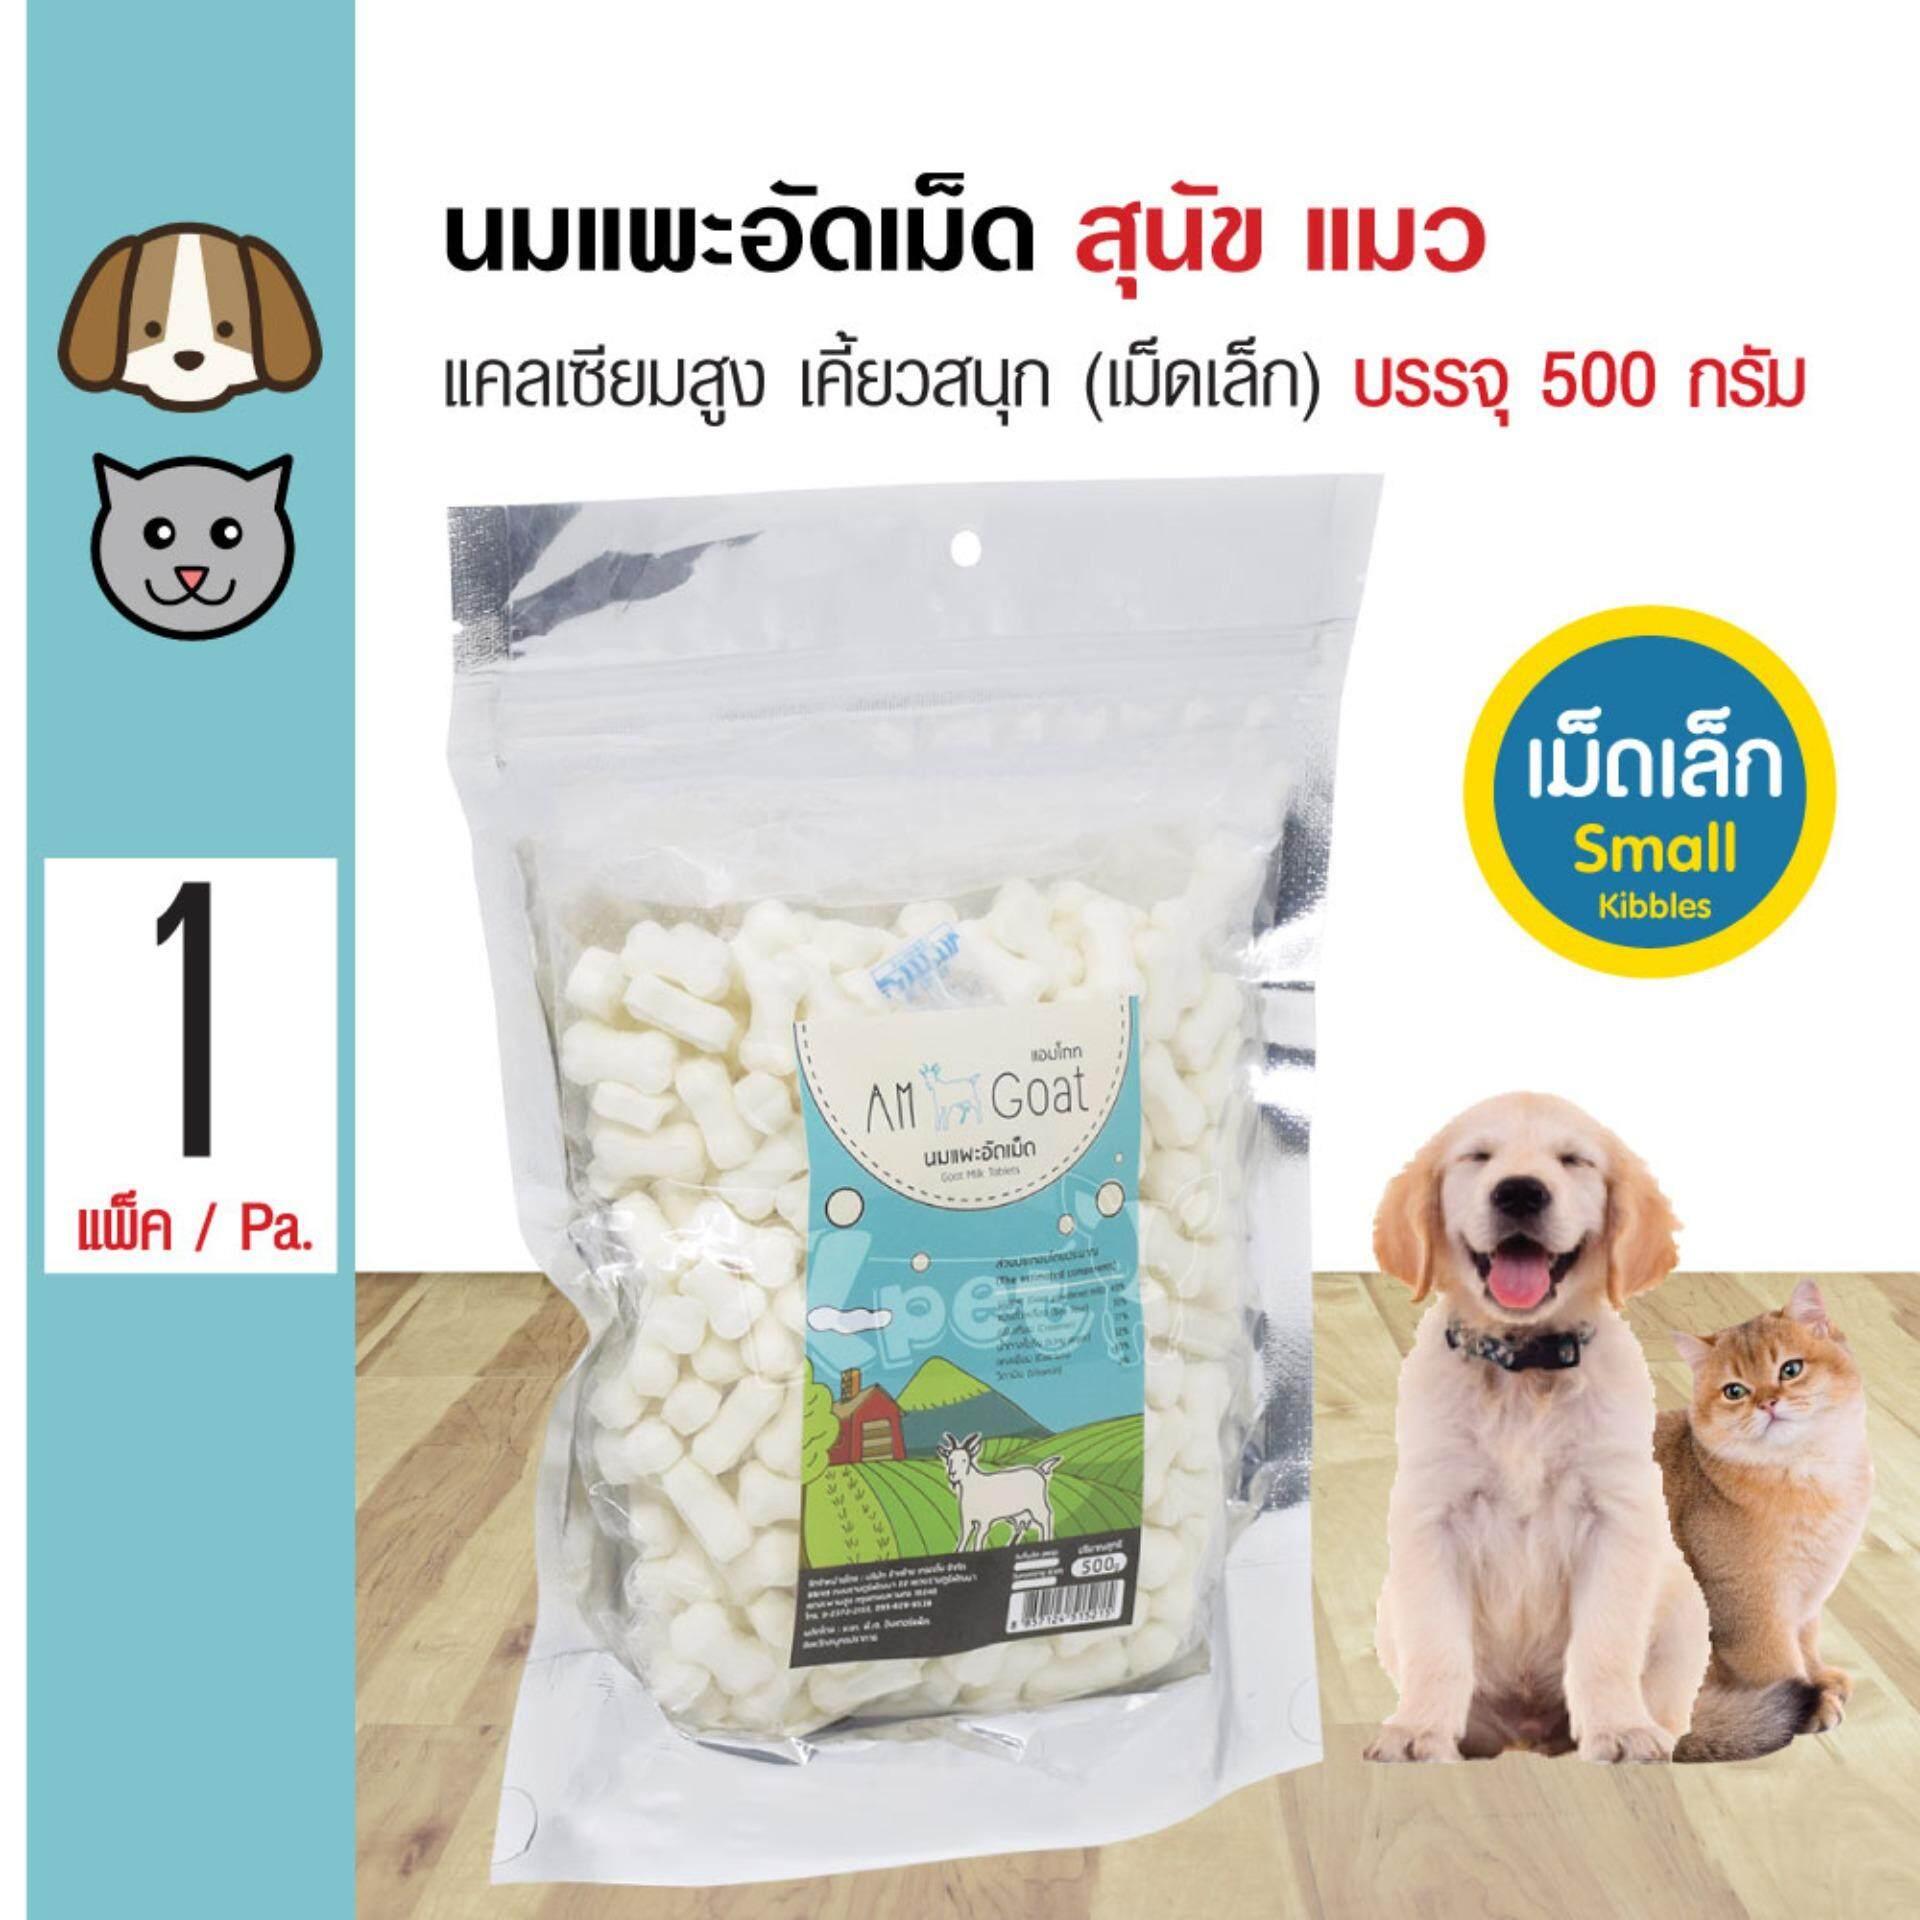 Am Goat ขนมสุนัข ขนมแมว นมแพะอัดเม็ด แคลเซียมสูง สำหรับสุนัขและแมว (เม็ดเล็ก) (500 กรัม/แพ็ค) By Kpet.